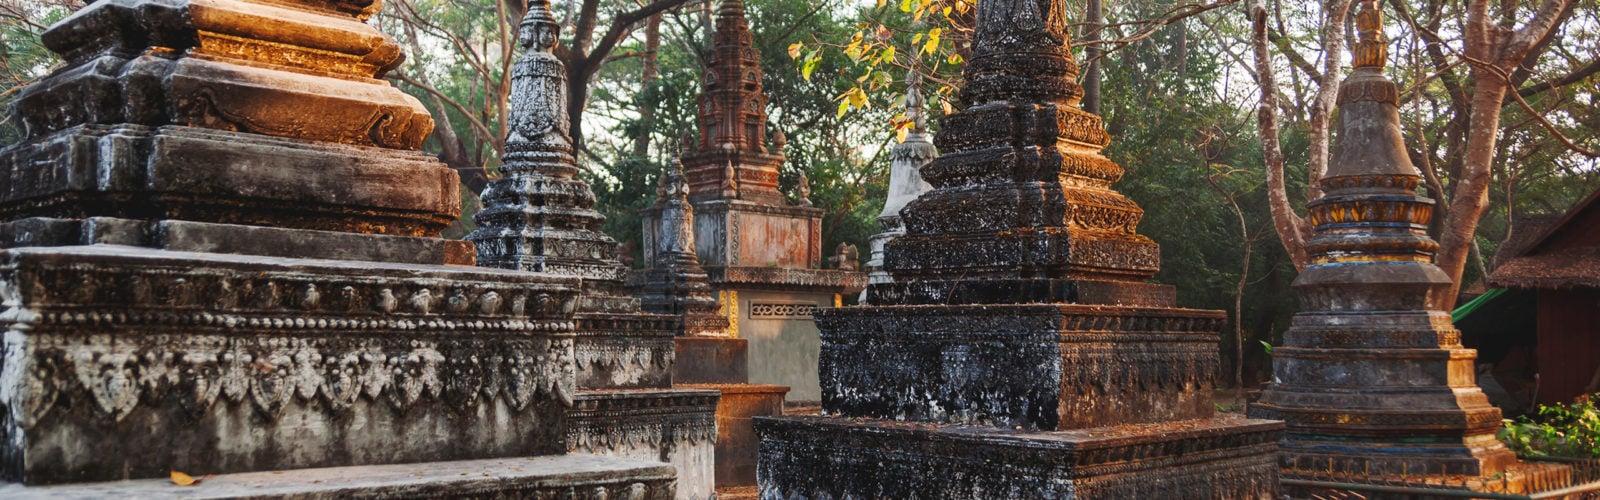 angkor-wat-sunrise-detail